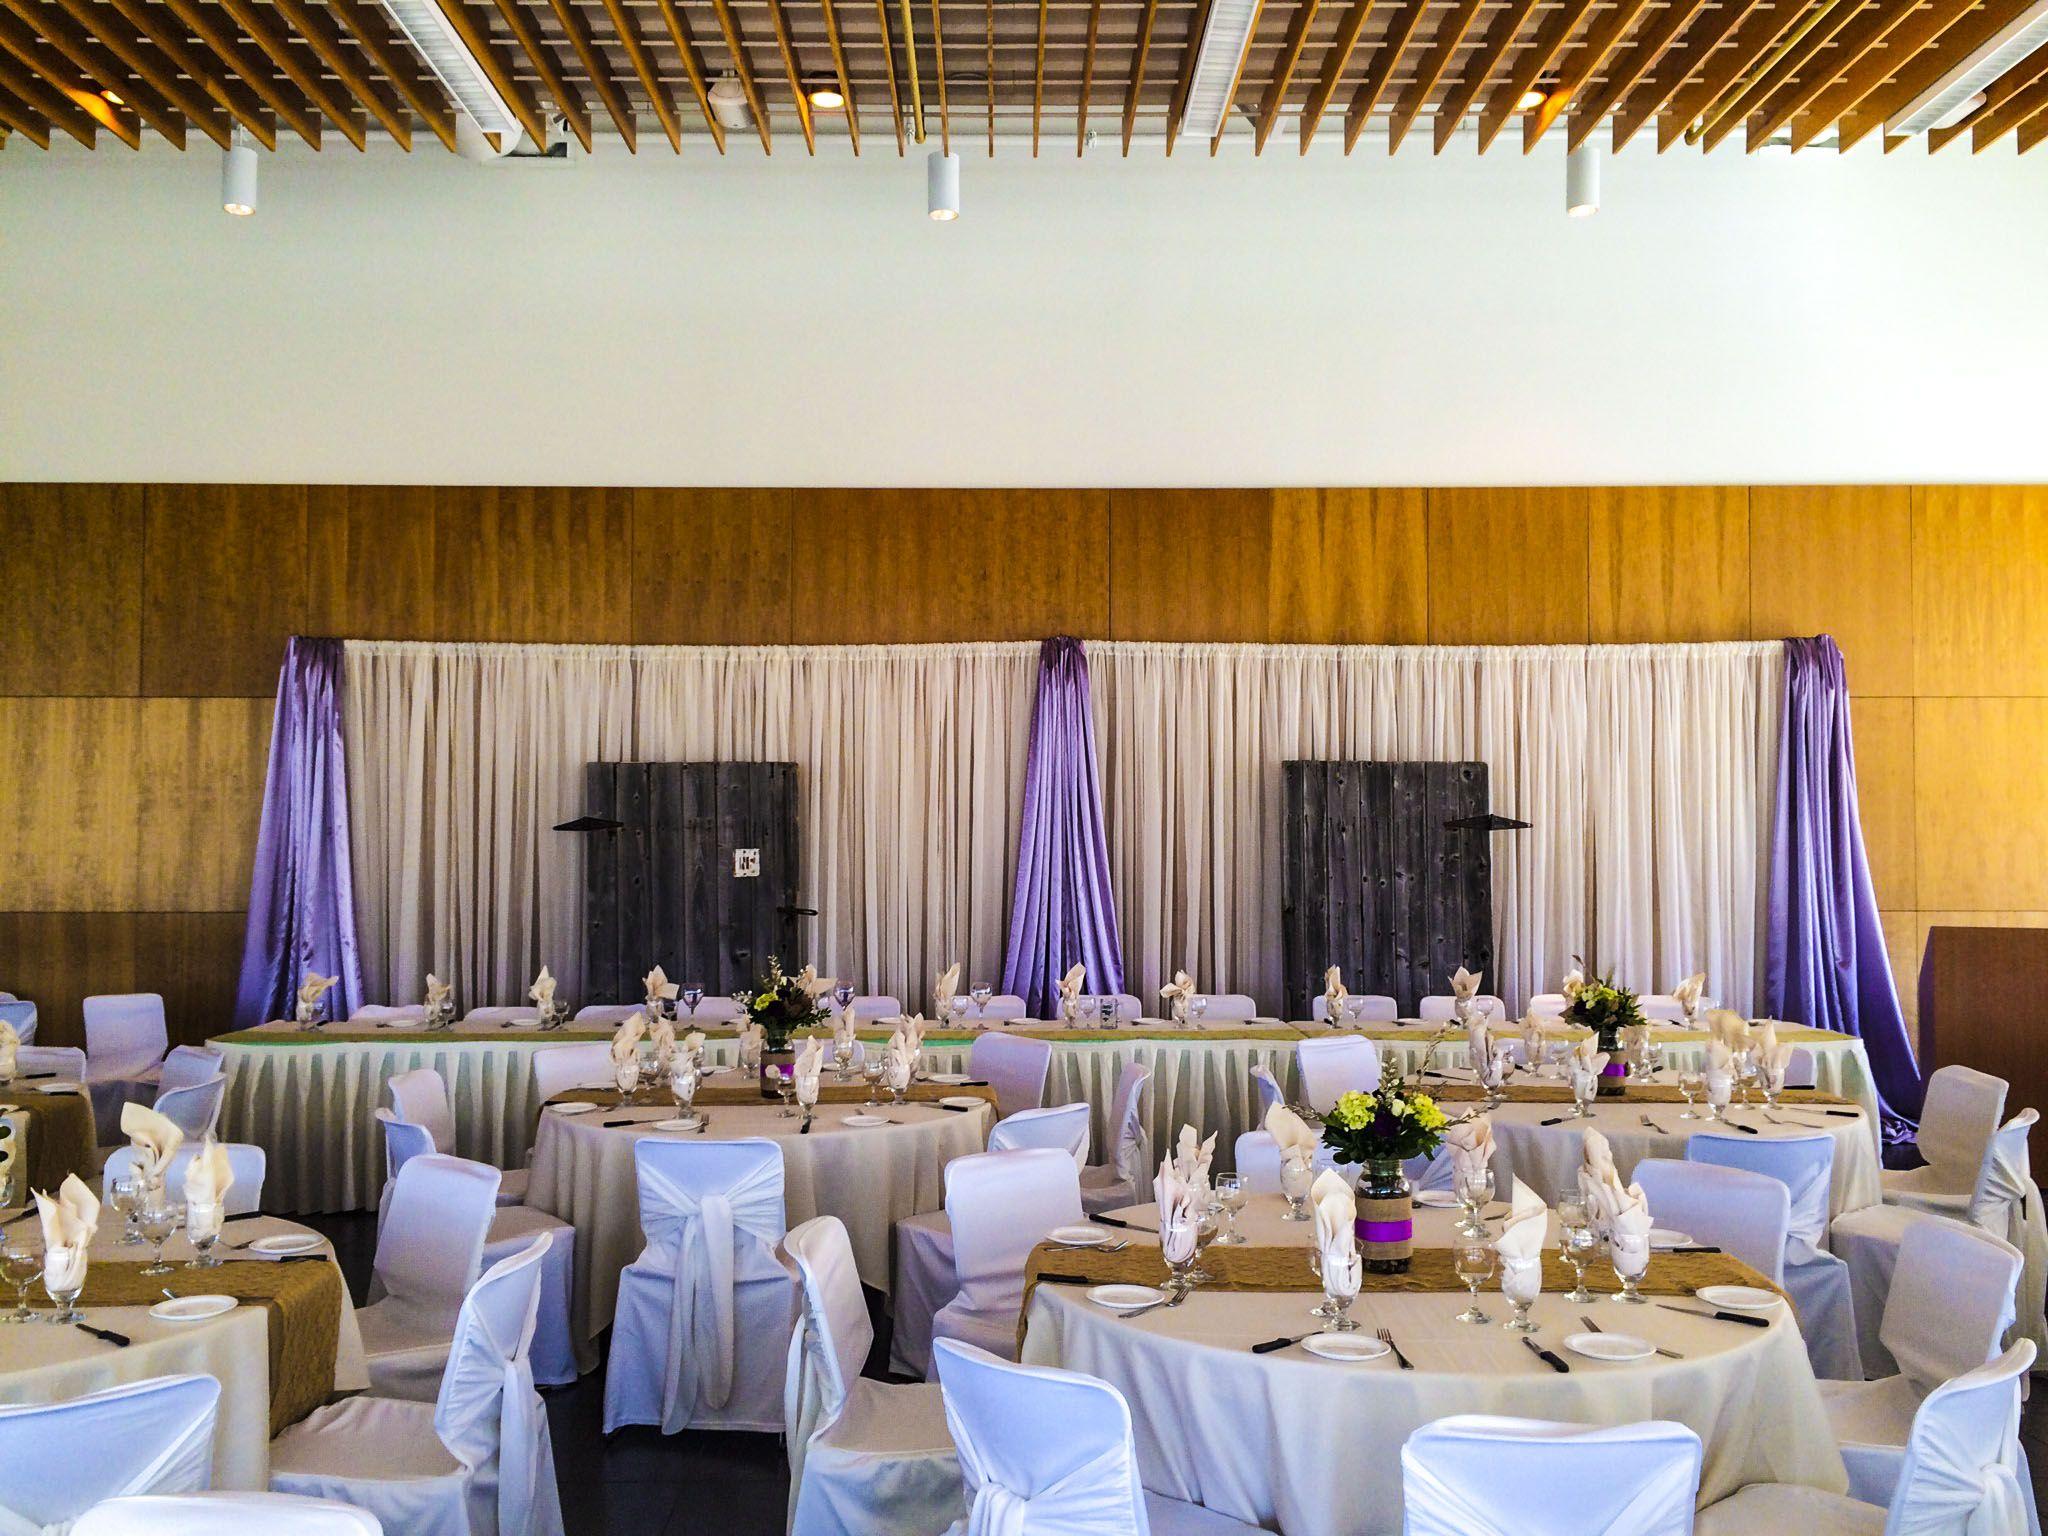 Country Elegance Wedding Lachefs Lachefsdecor Decor Catering Backdrop Headtable